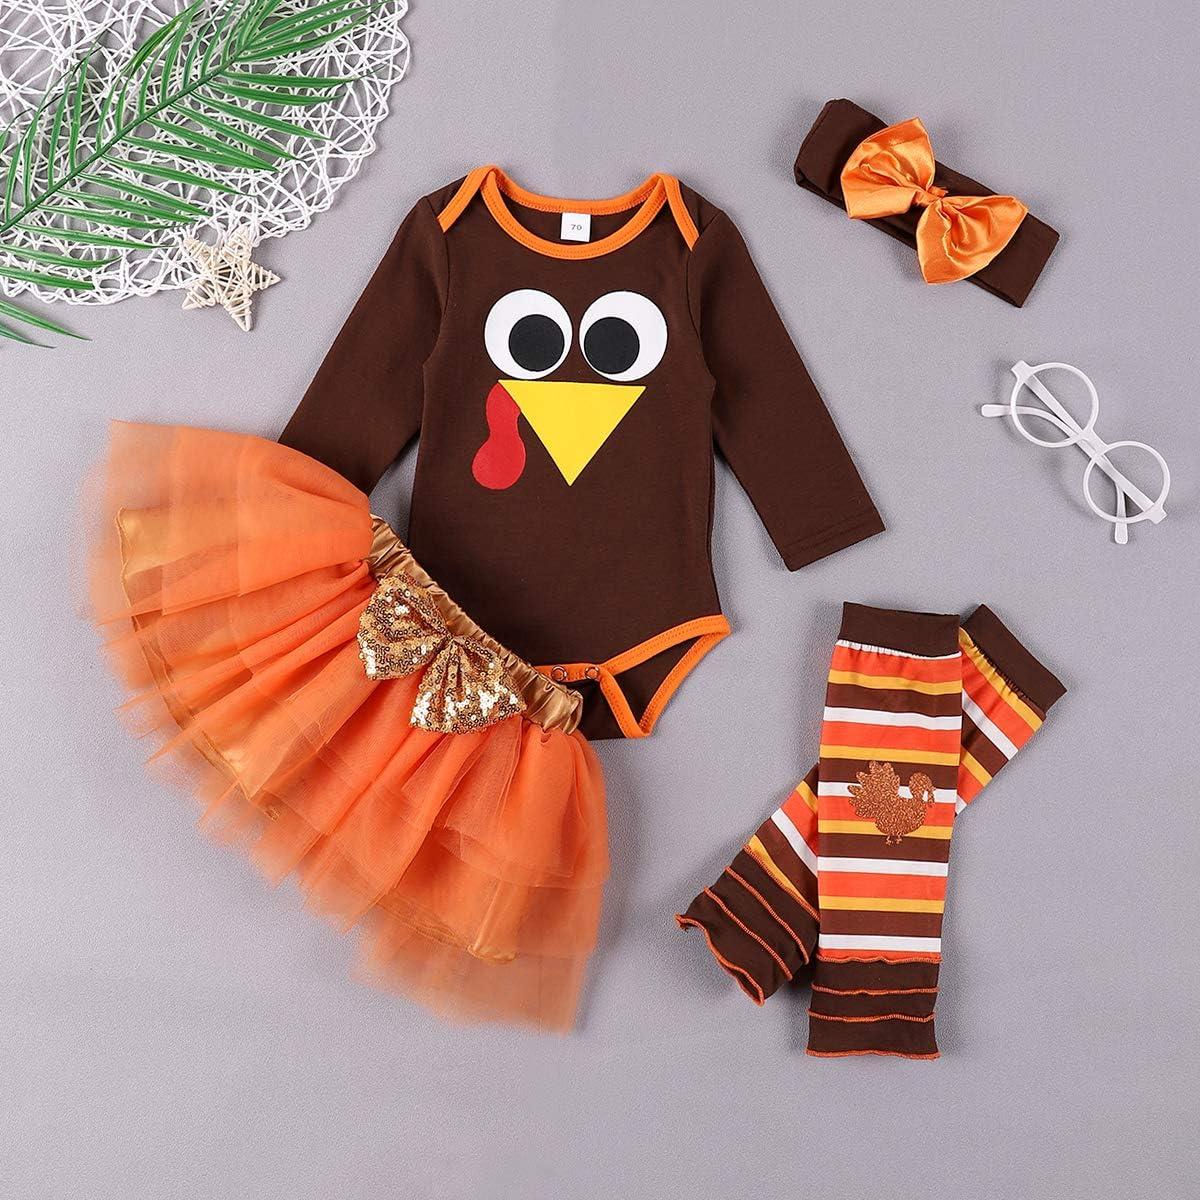 bilison Newborn Baby Girl Halloween Clothes Pumpkin Smile Ruffle Sleeve Romper Floral Suspender Shirt Headband Outfits